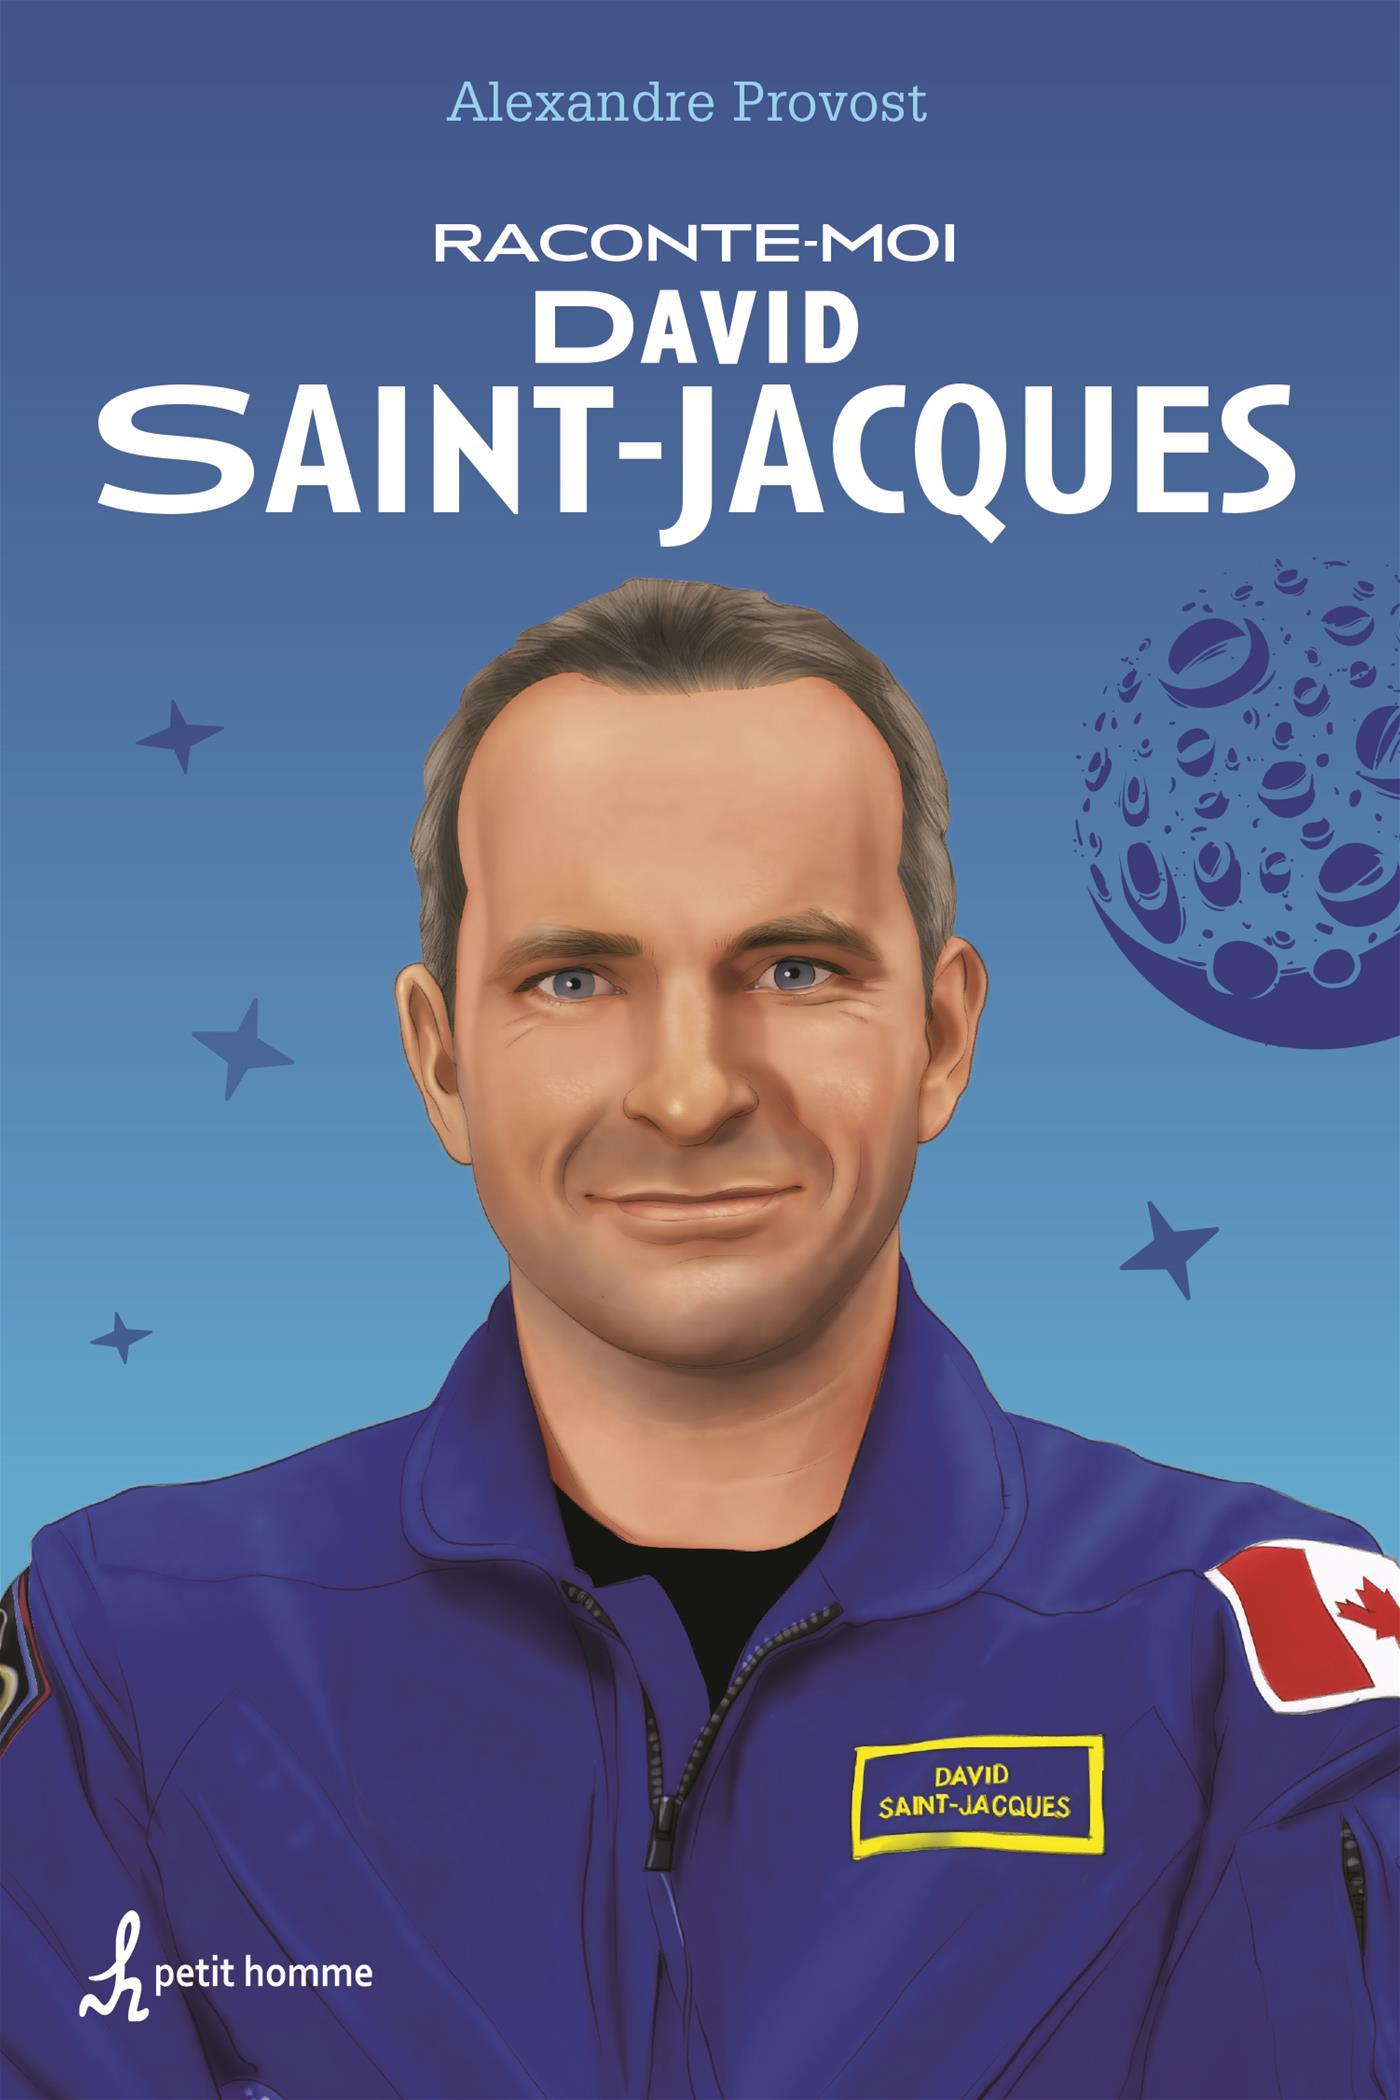 Raconte-moi David Saint-Jacques - Nº 34